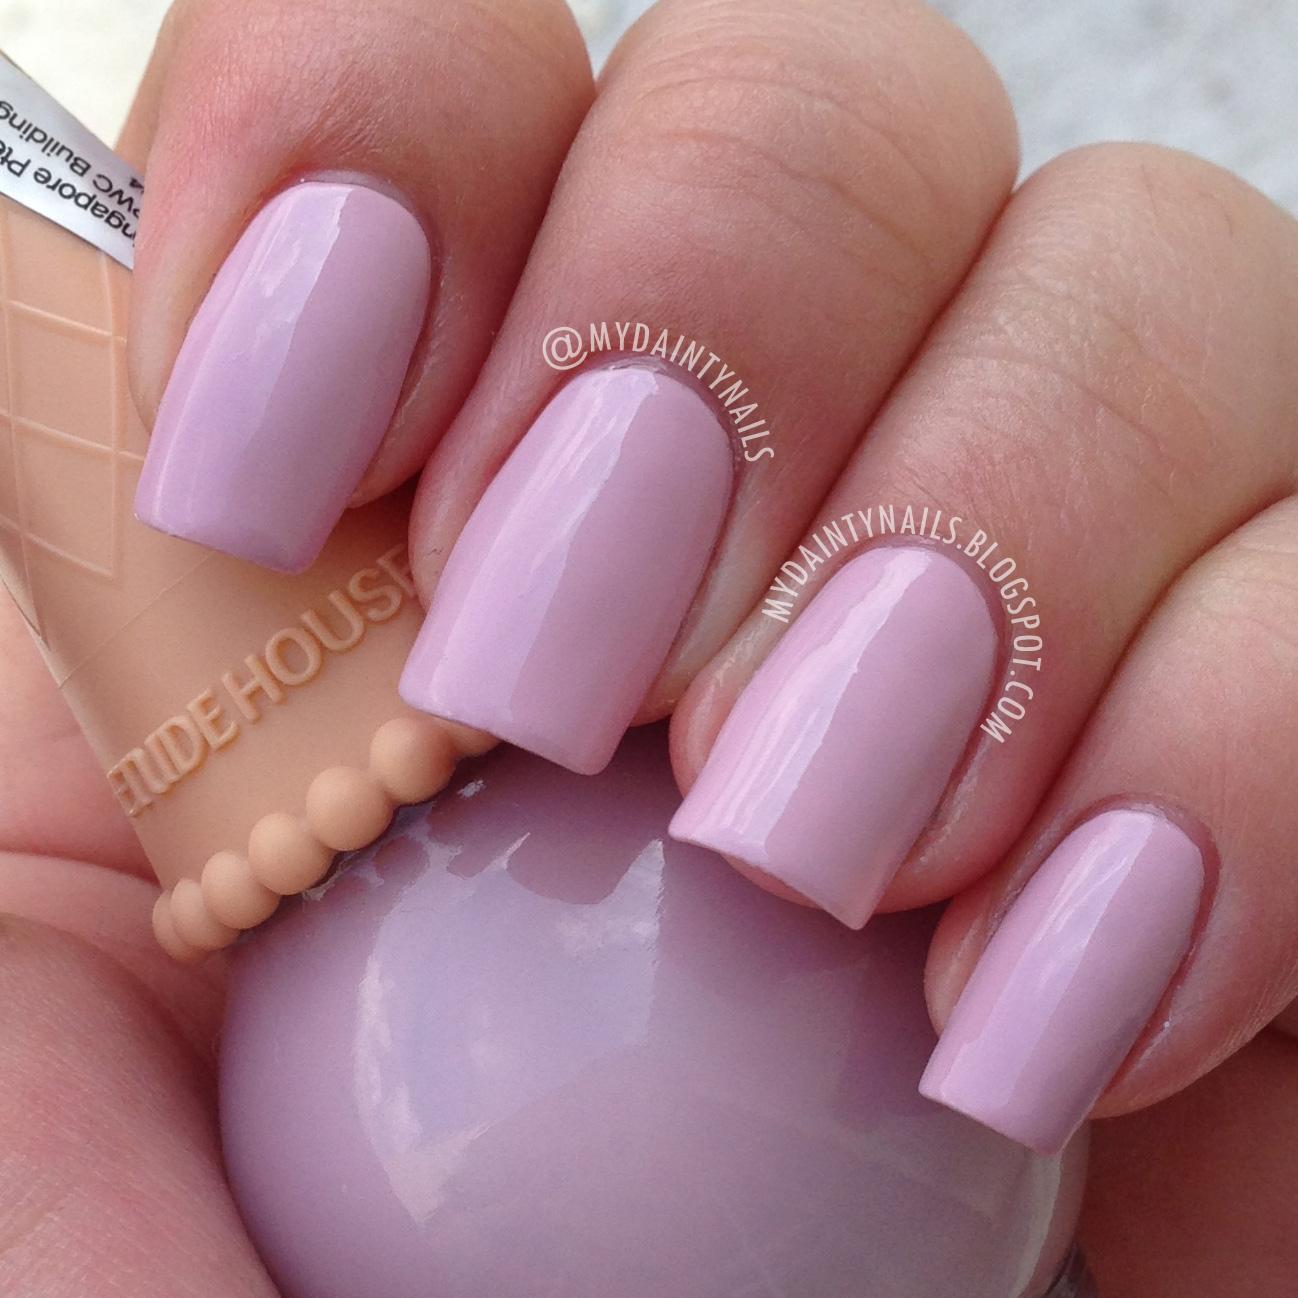 My Dainty Nails: Etude House Ice Cream Nail Polish Review